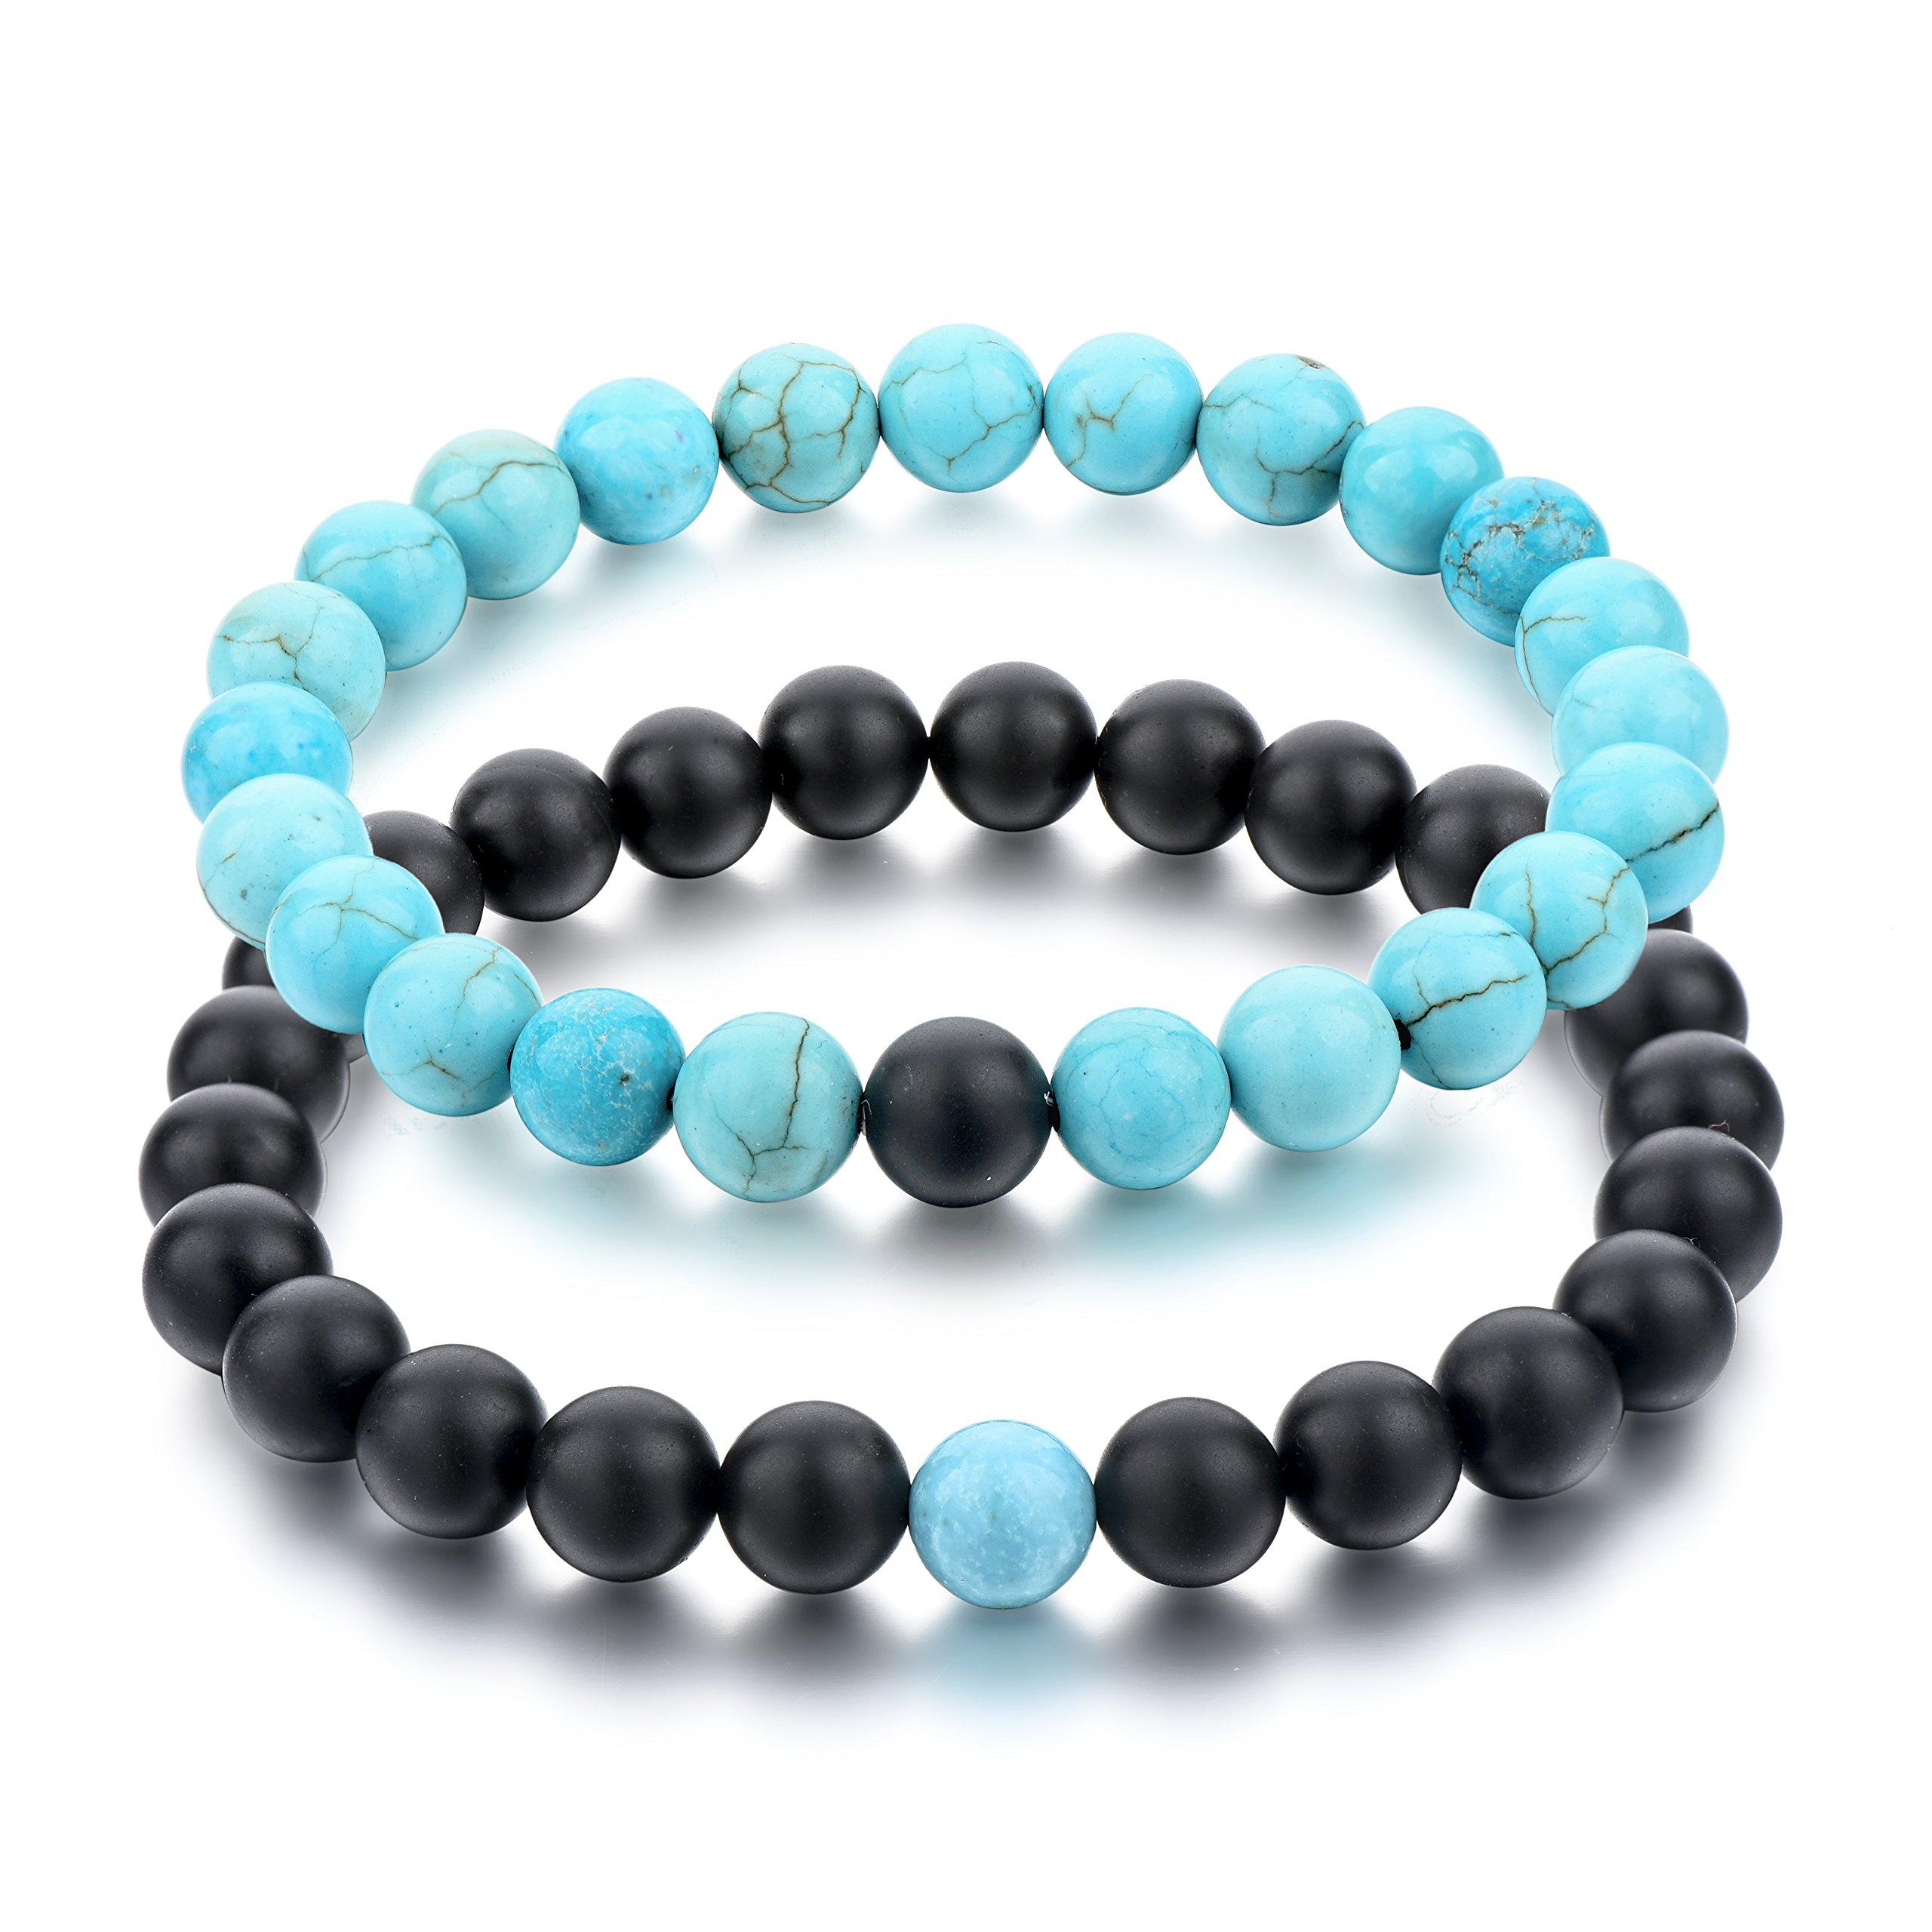 Long Way His and Hers Bracelets Black Matte Agate & Blue Turquoise 8mm Stone Beads Bracelet(2 pcs)